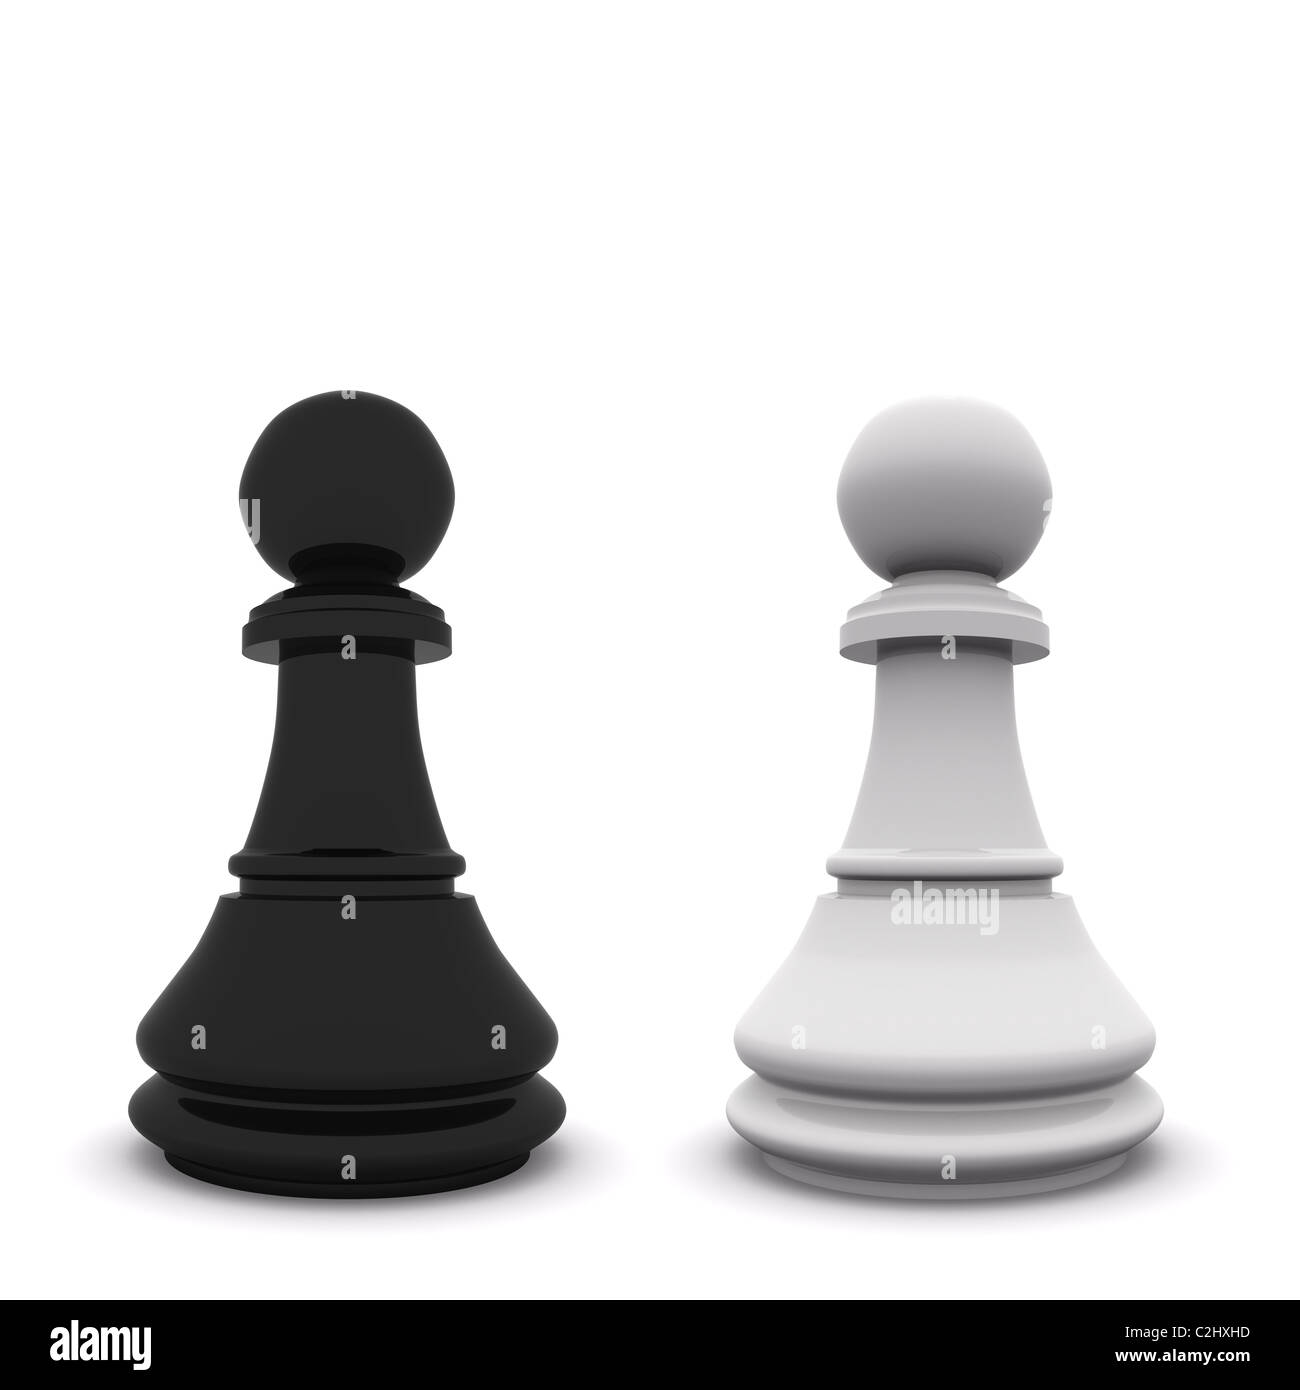 pawns - Stock Image